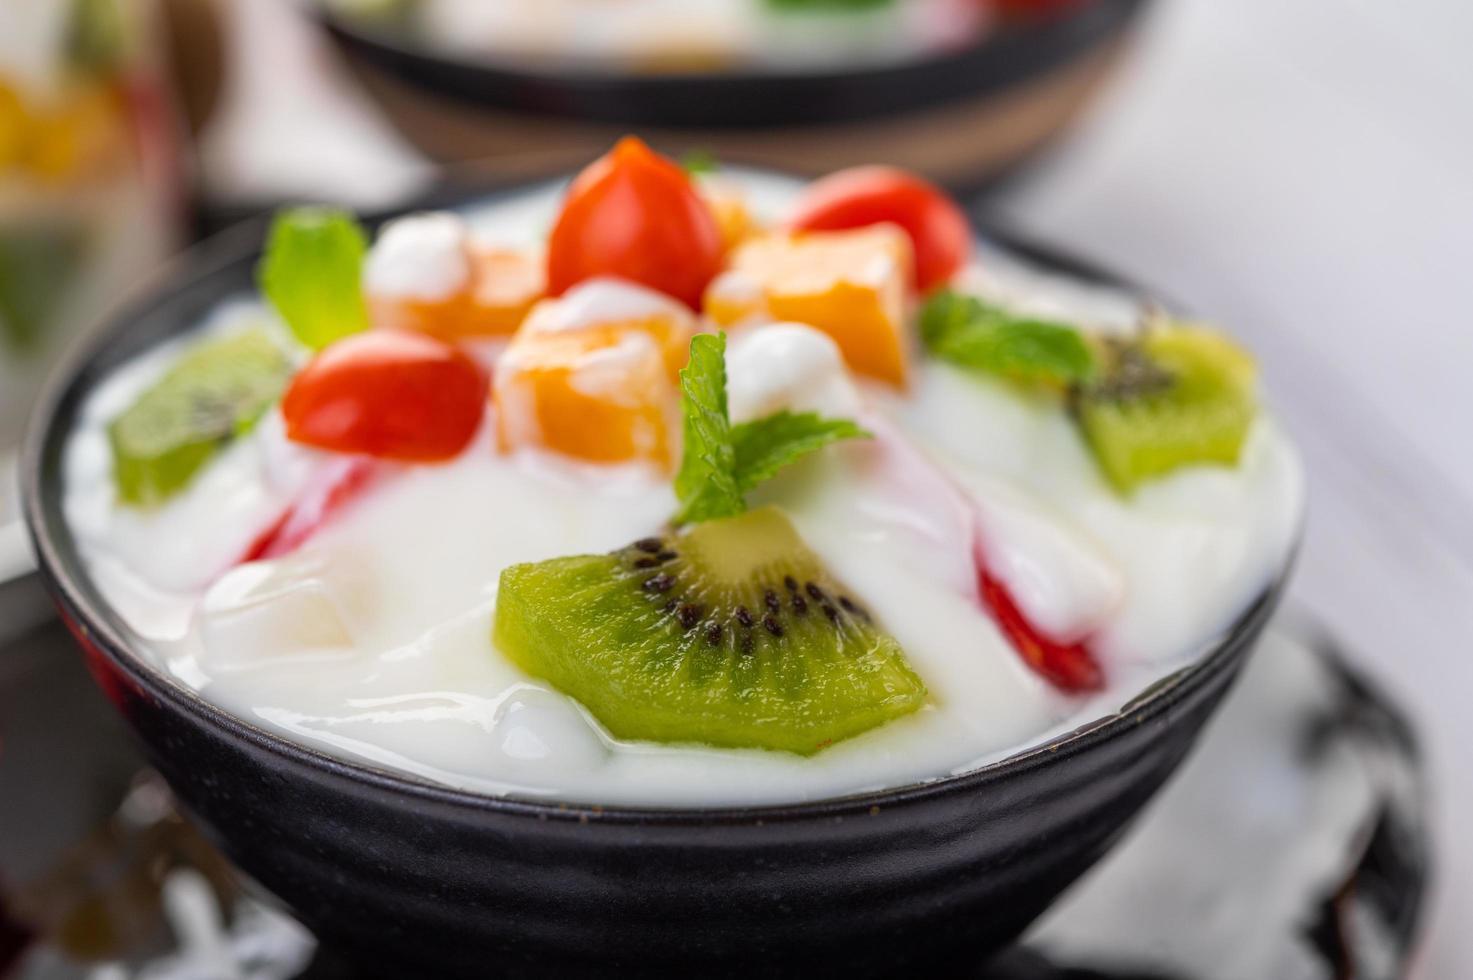 salade de fruits dans un bol de yaourt photo